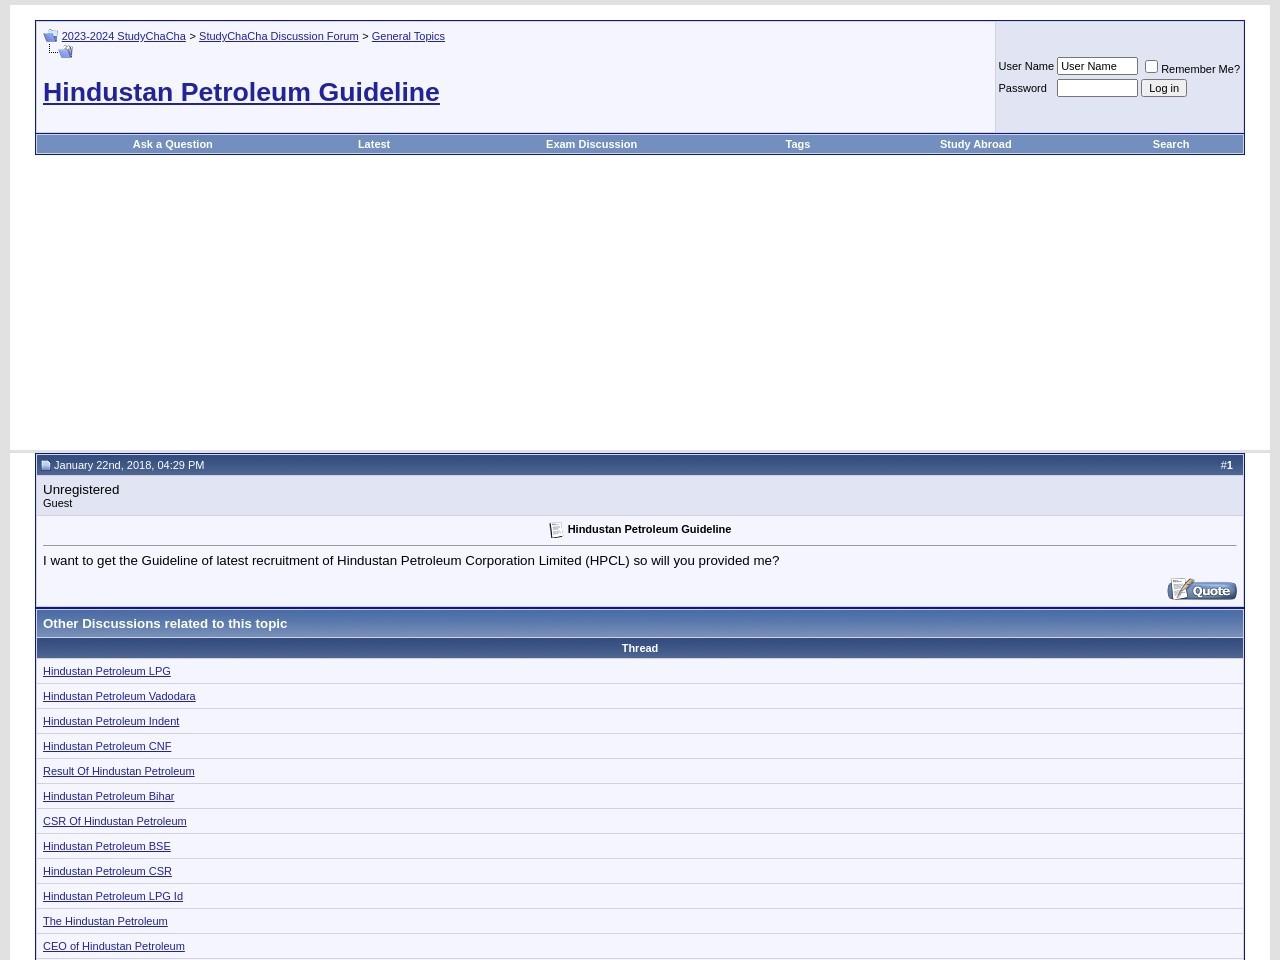 Hindustan Petroleum Guideline